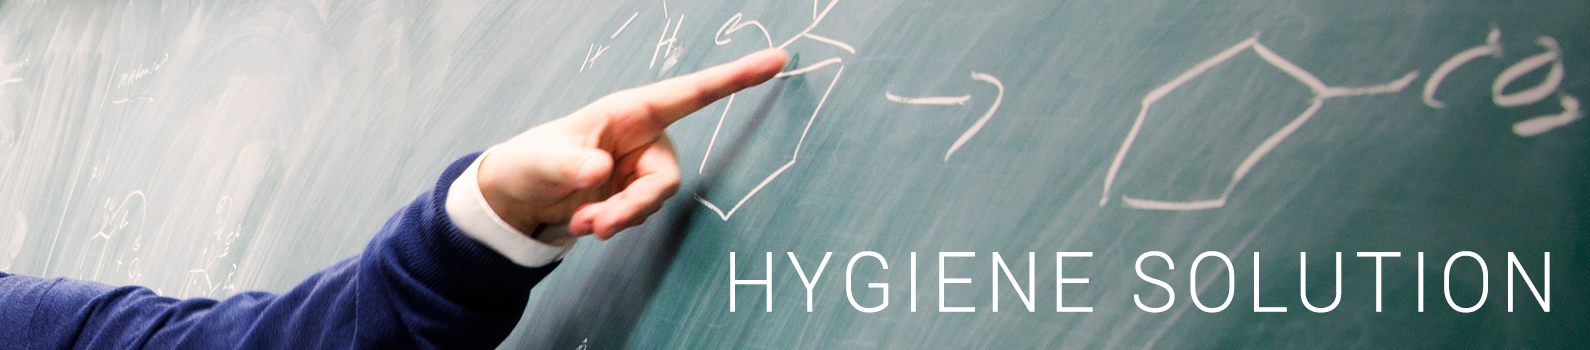 Hygiene Solution 2